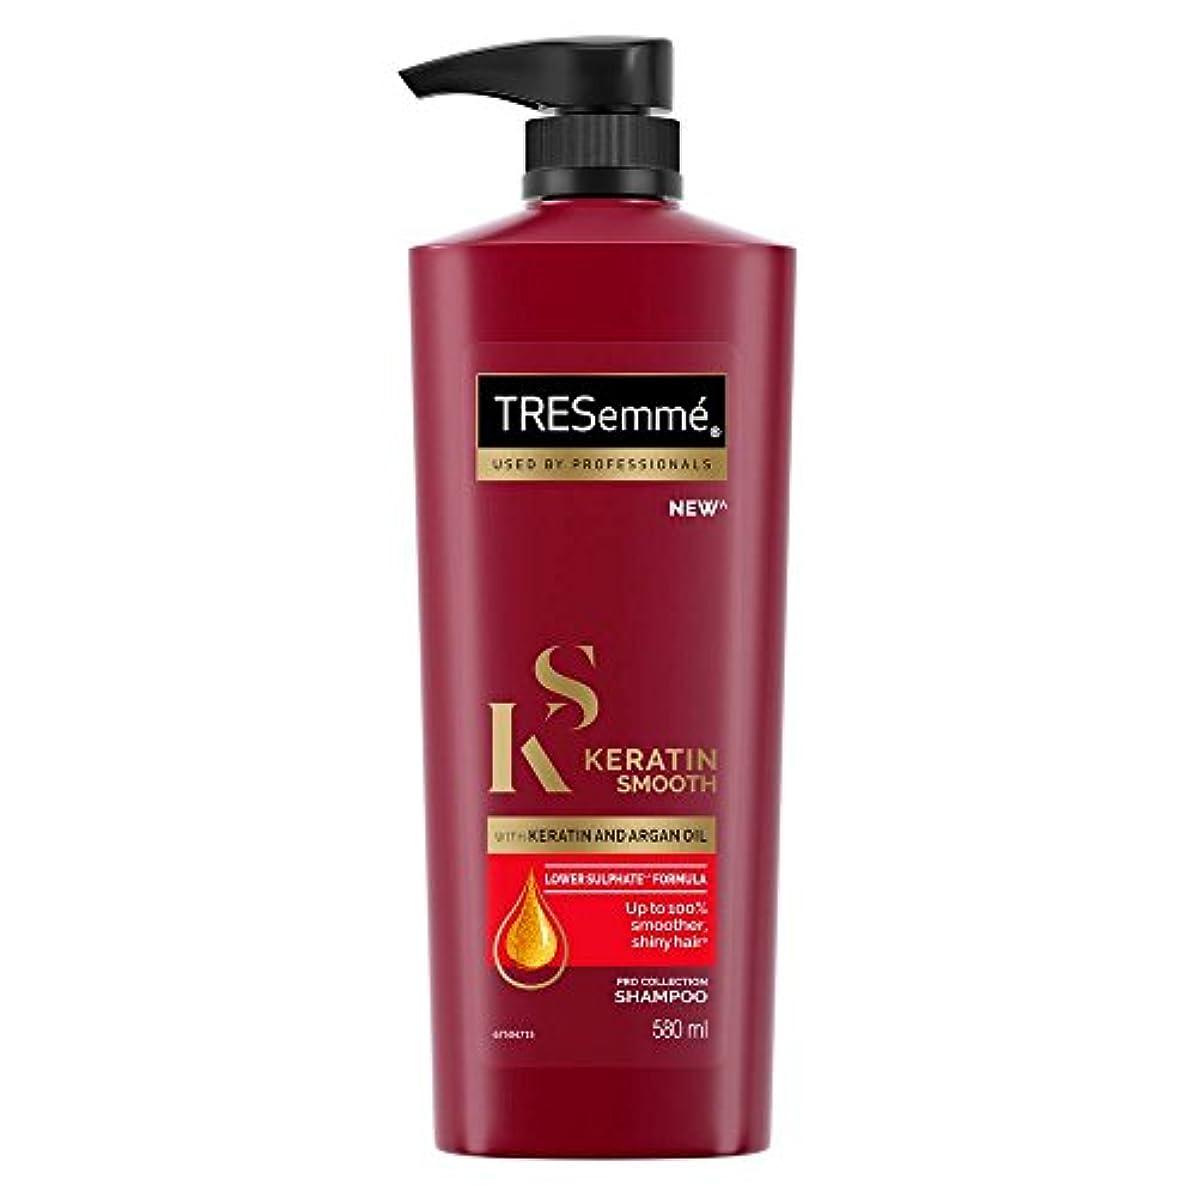 TRESemme Keratin Smooth Shampoo, 580ml (TRESemmeケラチンスムースシャンプー、580ml)